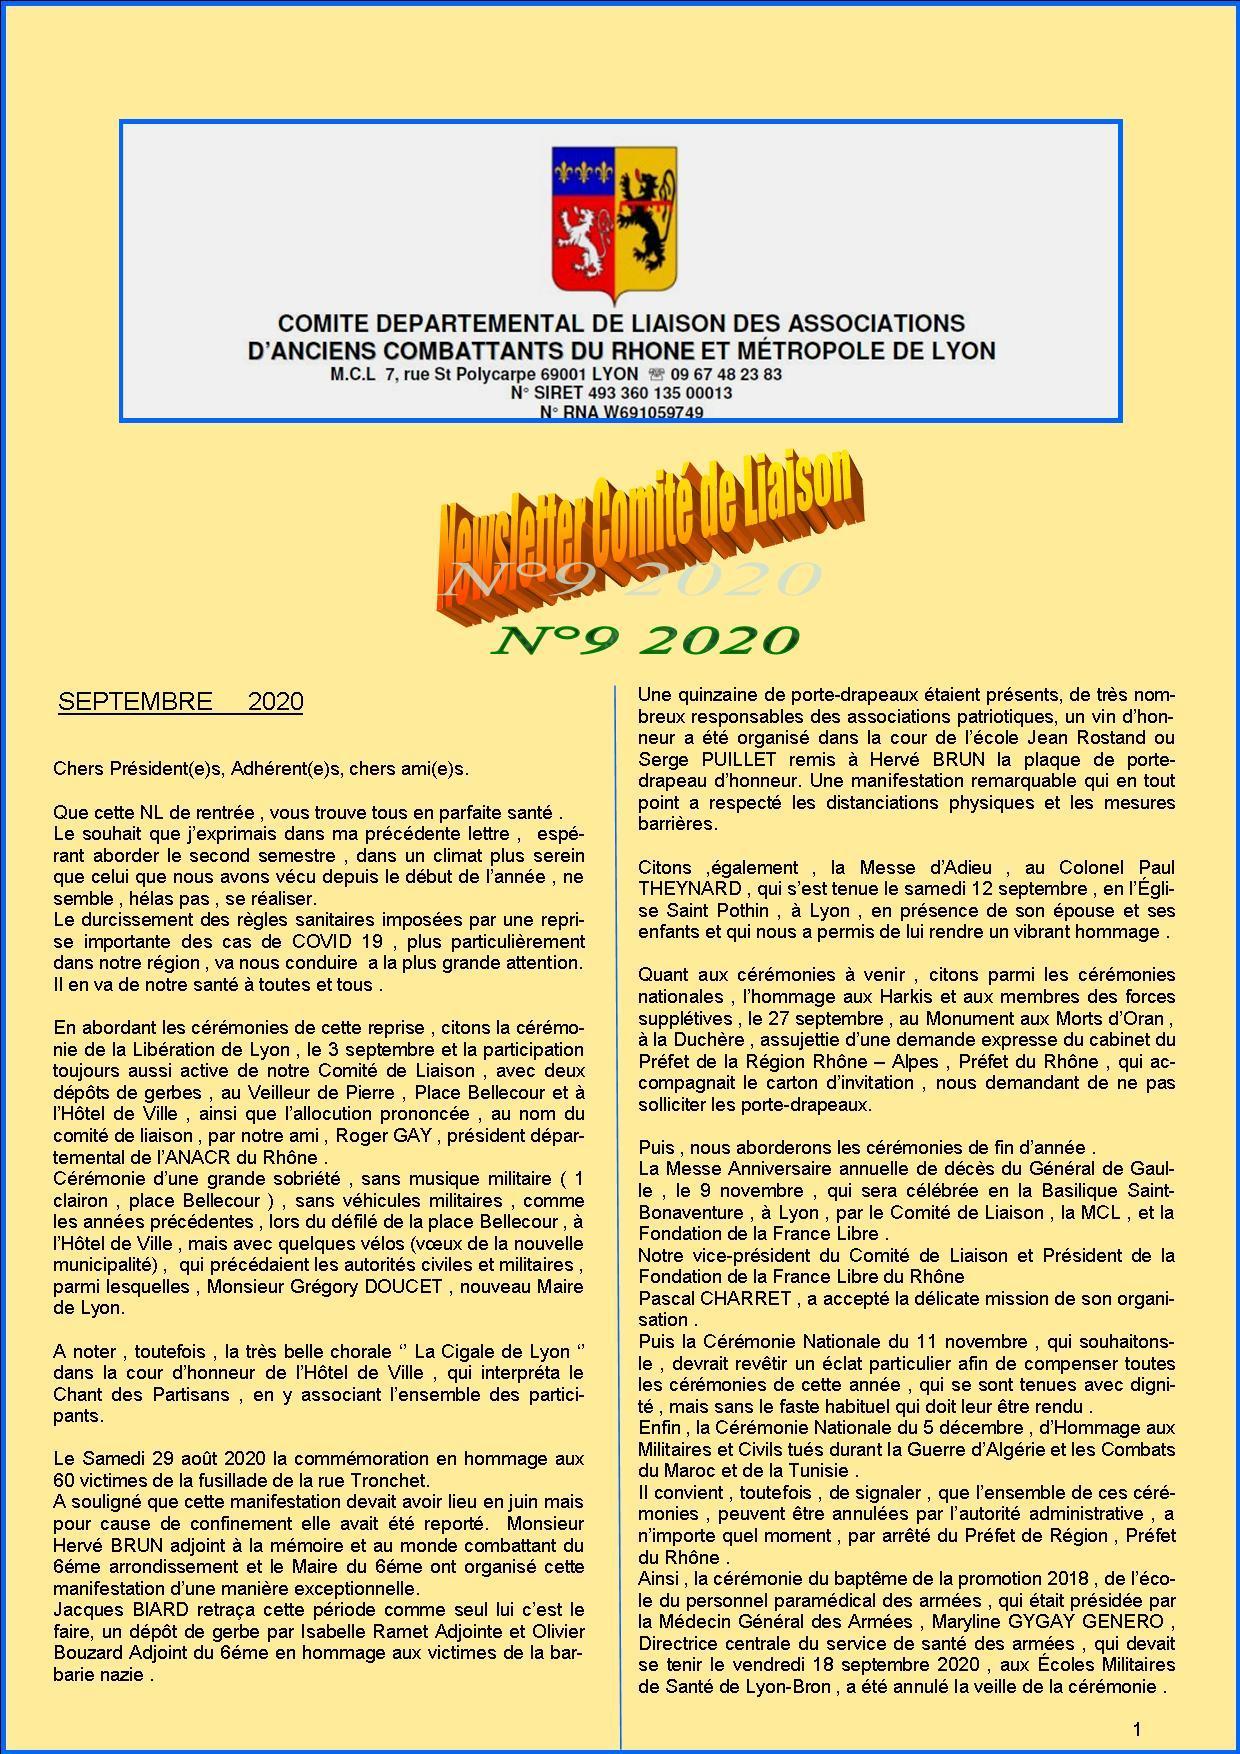 Newsletter comite de liaisonn 9 2020